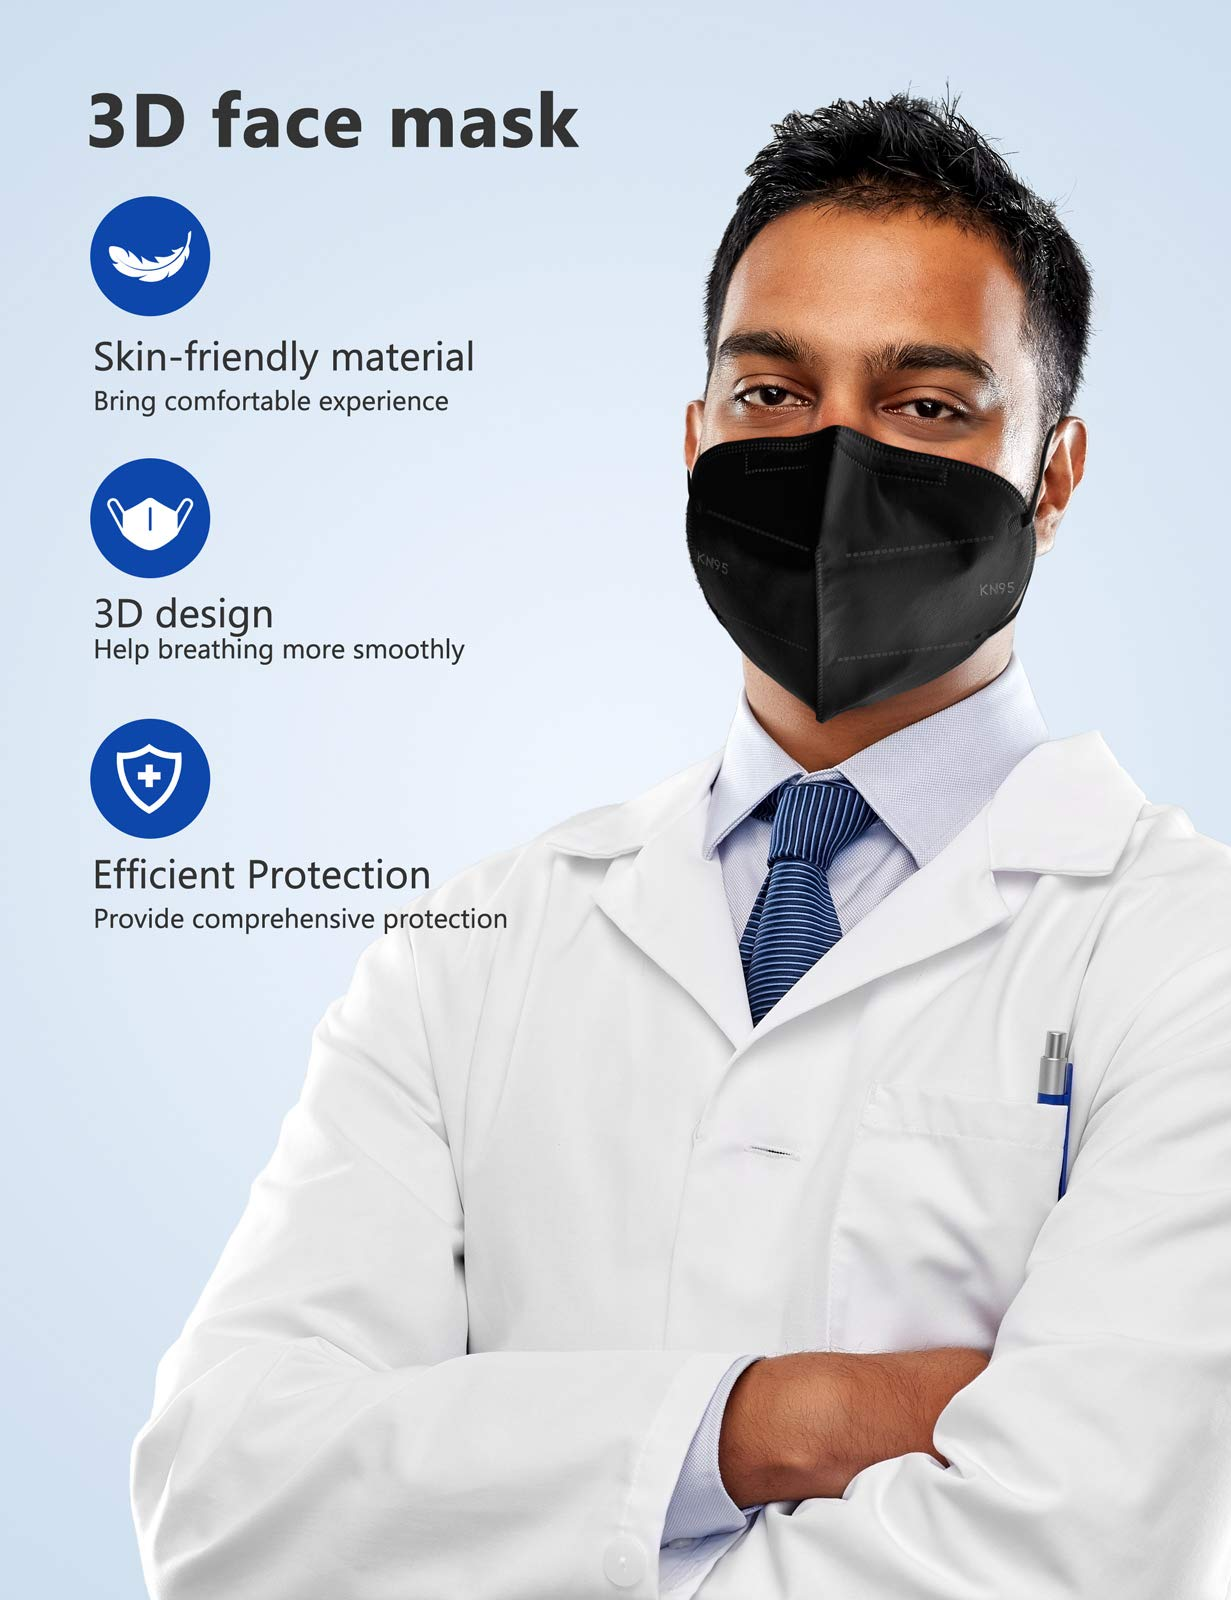 Boncare KN95 Face Mask, Black KN95 Mask 50 Pack, 5-Layer Face Mask